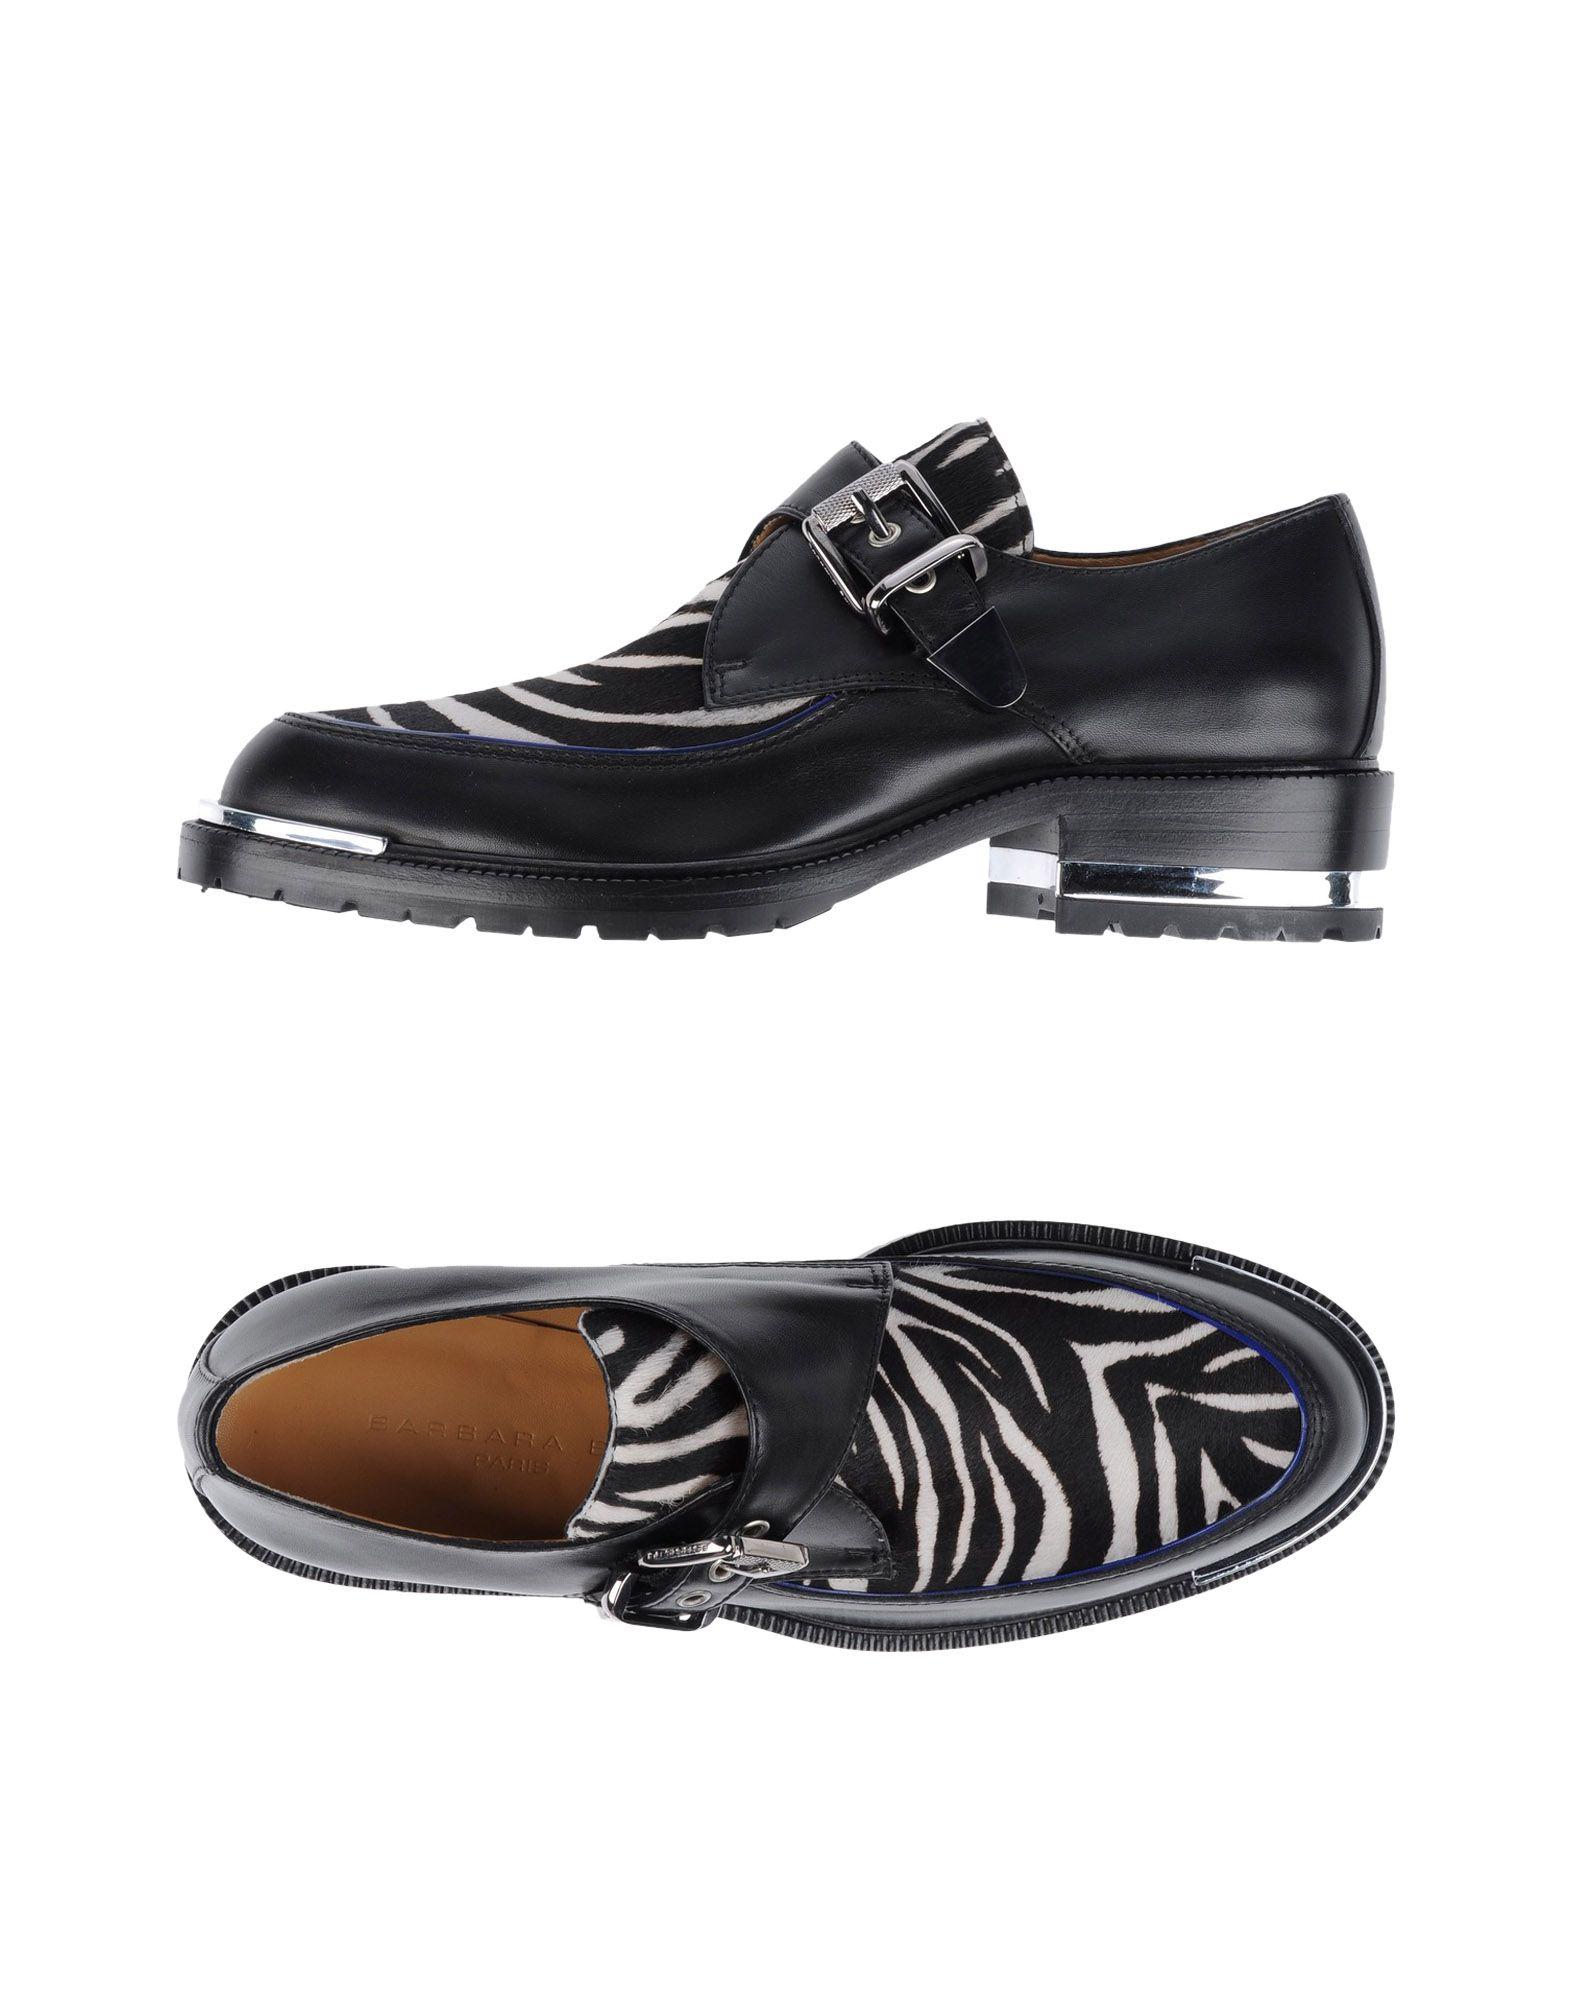 Barbara Bui Mokassins Damen  11247388UXGut aussehende strapazierfähige Schuhe